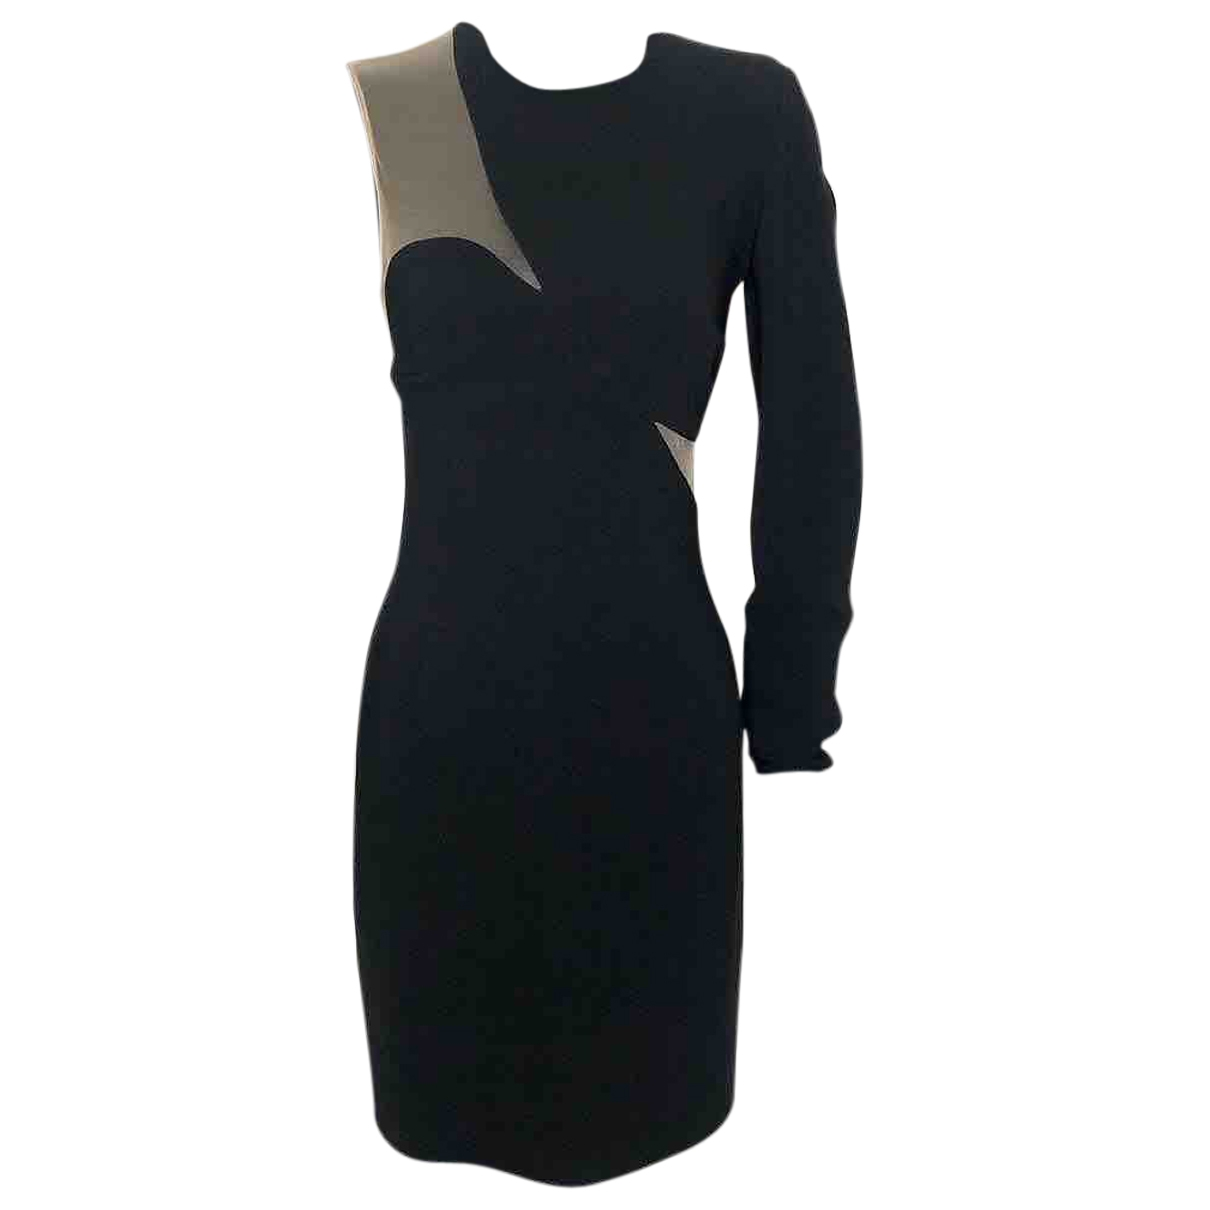 Stella Mccartney \N Kleid in  Schwarz Synthetik